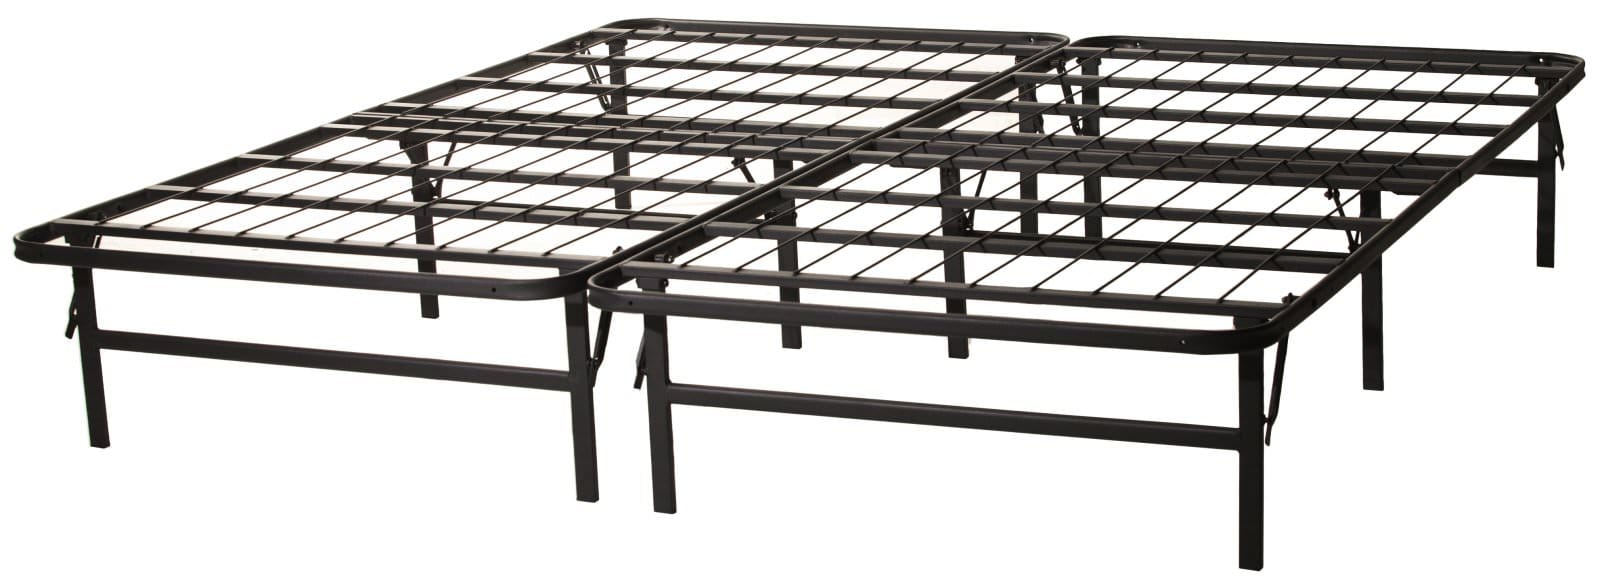 High Rise Bed Frame -